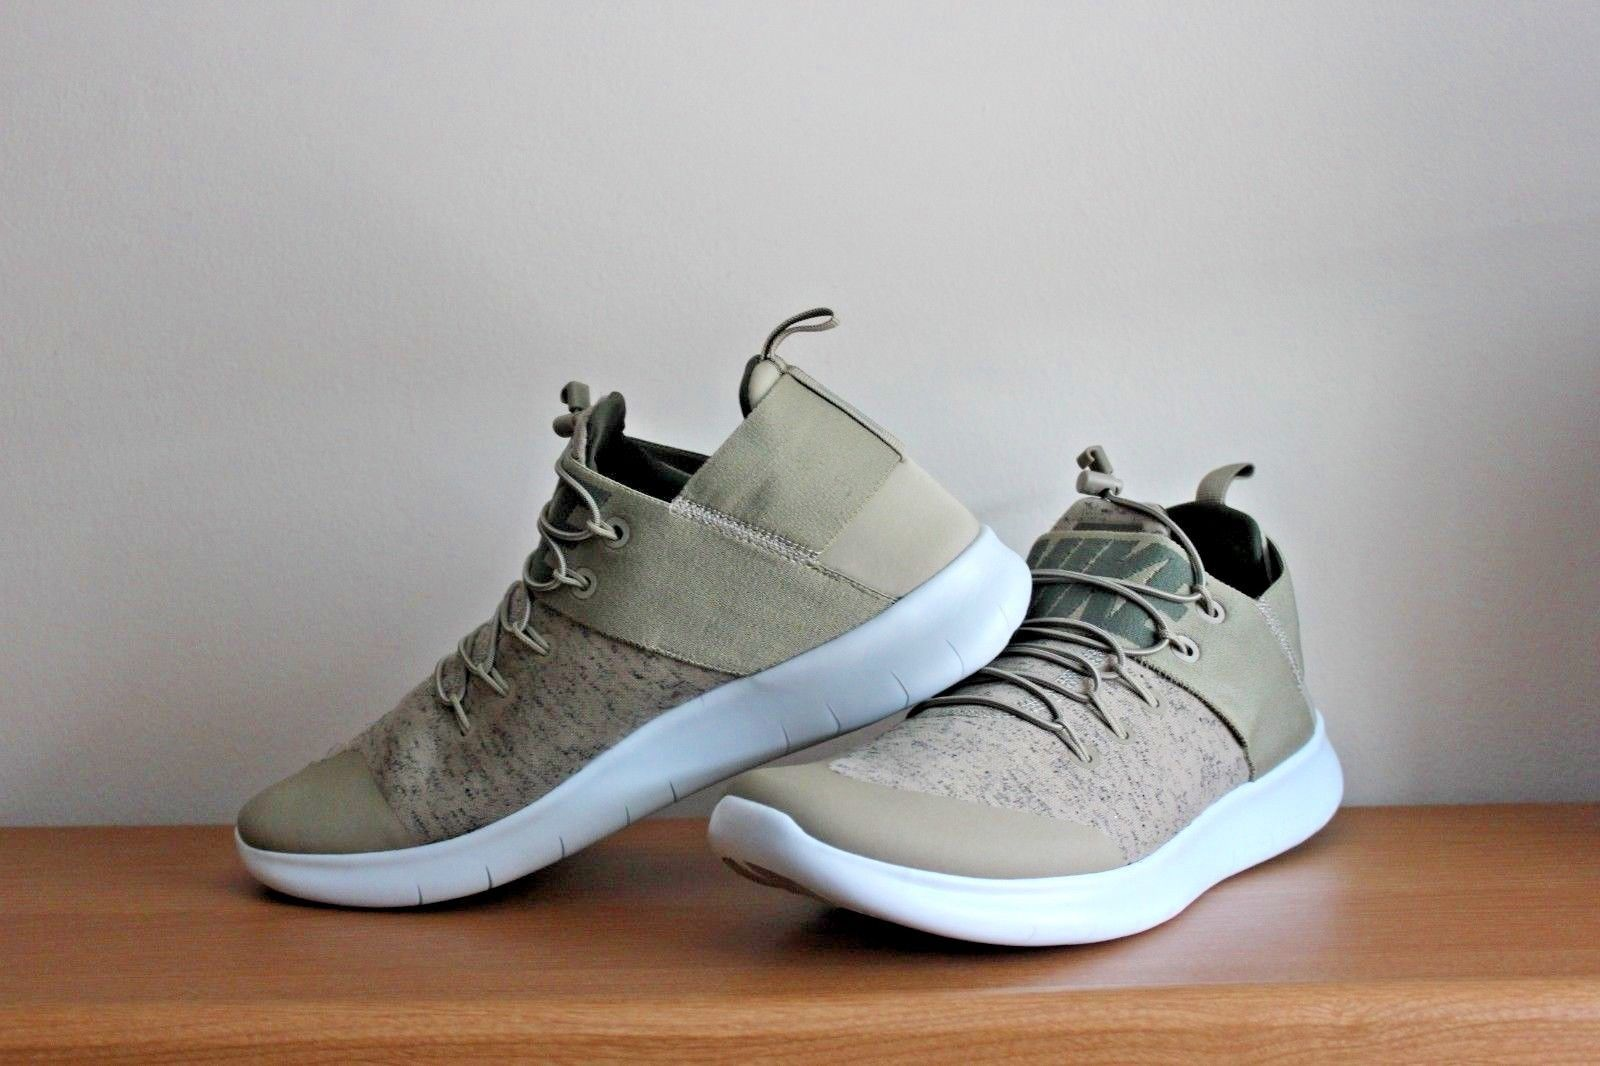 2af2c8f3f50 S l1600. S l1600. Previous. Men s Nike Free RN CMTR 2017 Premium Running  Training Shoes Size 10 NEW